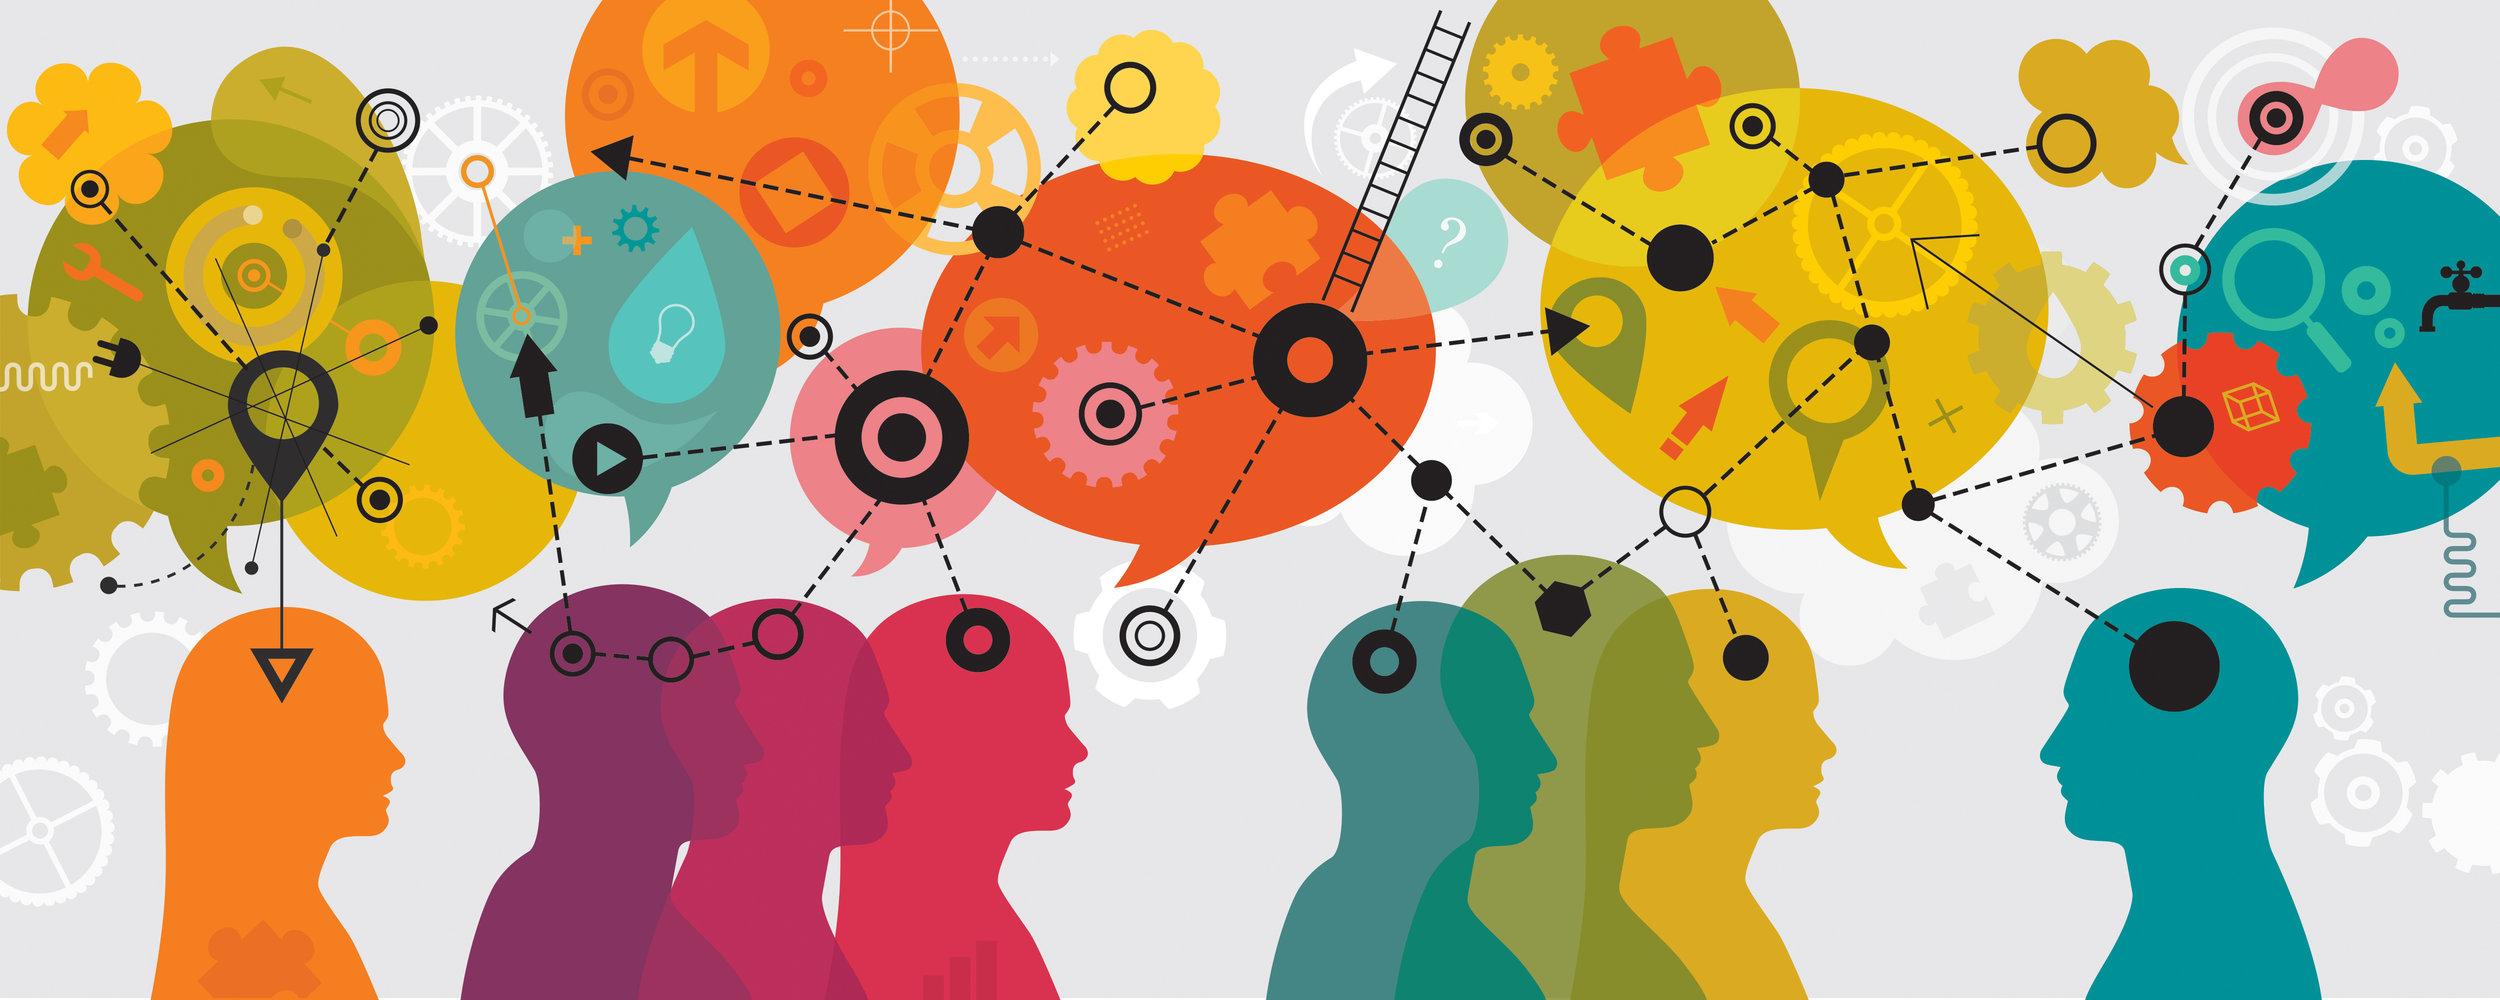 illustration communication, people thinking, connection, public speaking